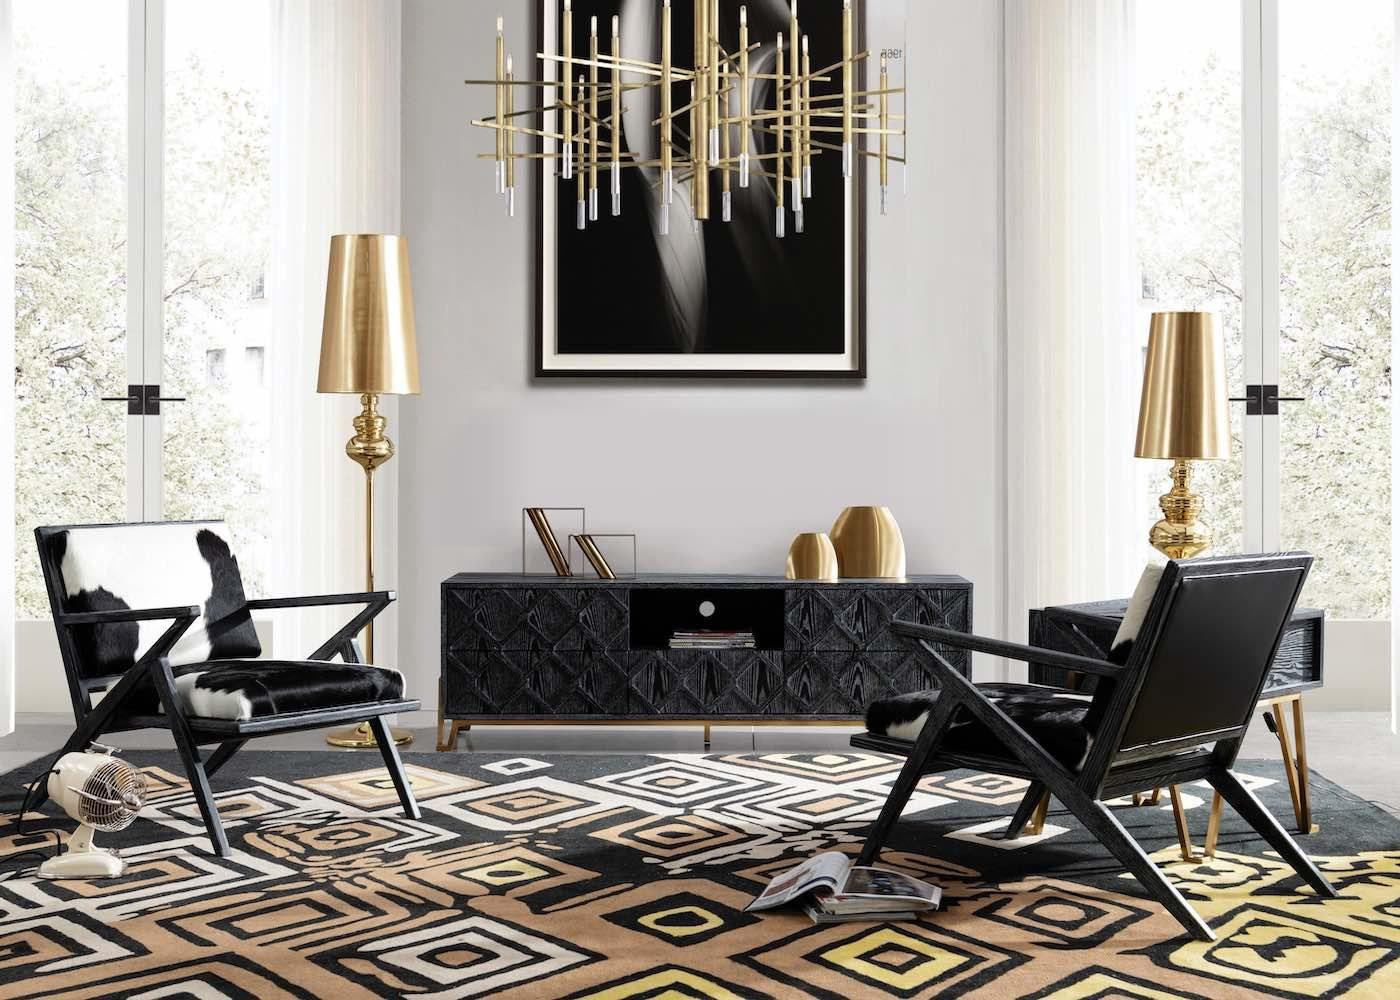 mazarin-ameublement-catalogue-produits-chaise-fauteuil-13